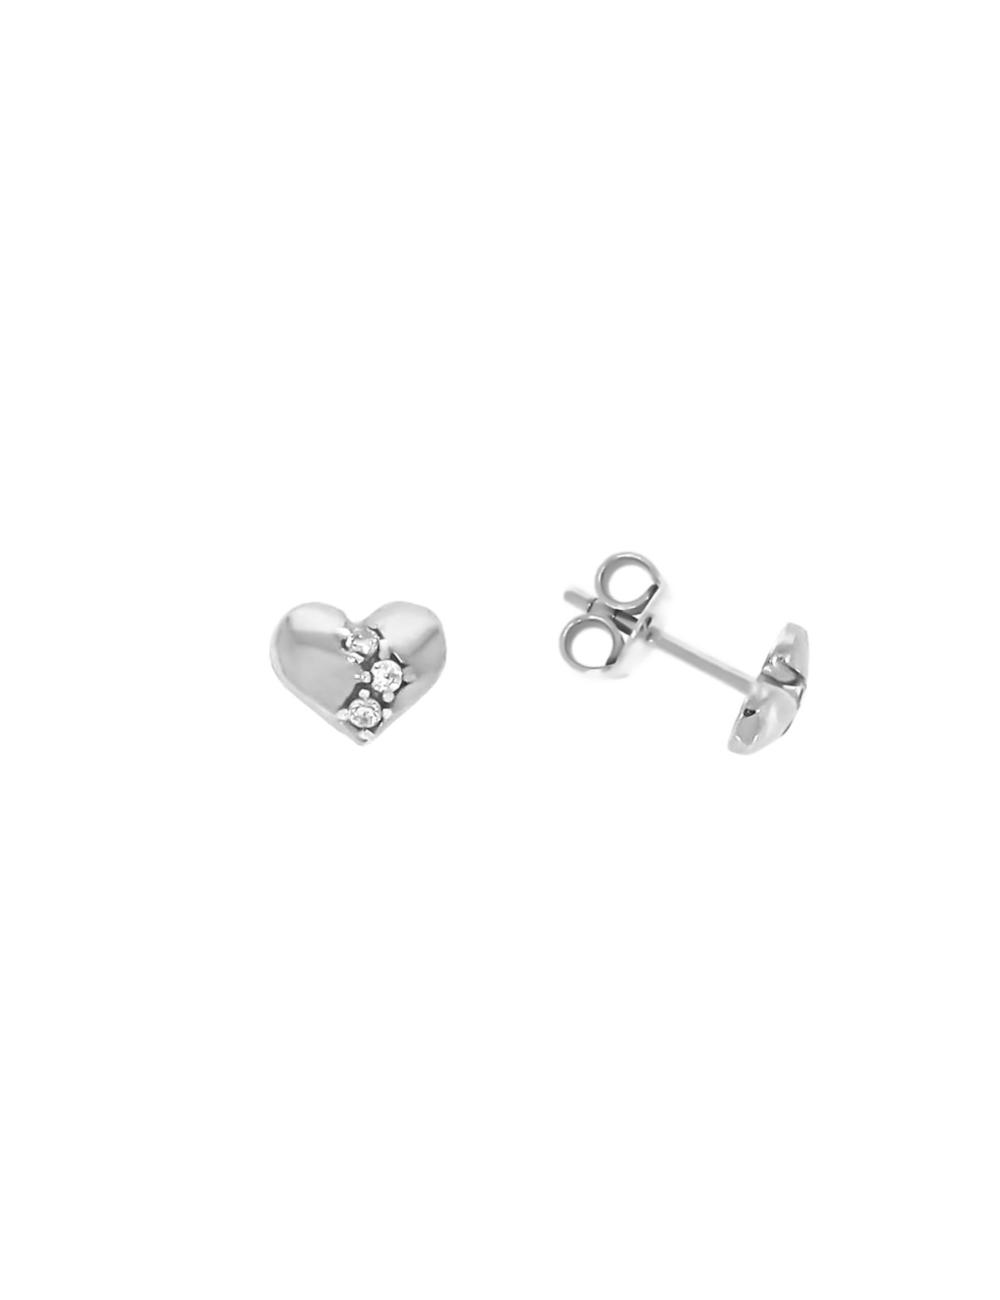 10010108 Kolczyki srebrne pr.925 z cyrkoniami